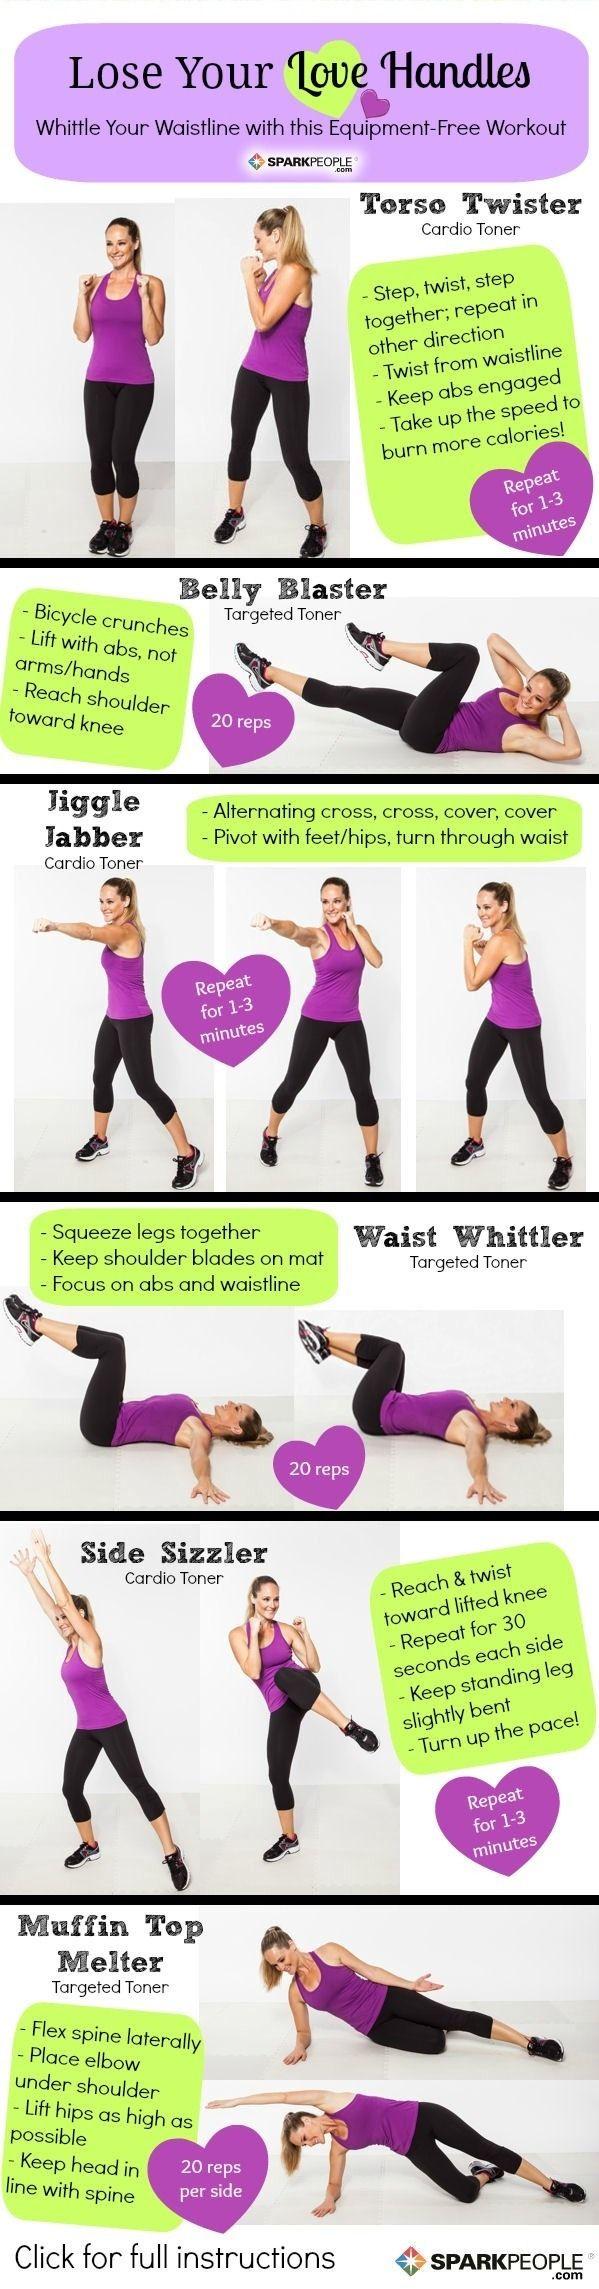 Workout For Perky Boobs #Health #Fitness #Trusper #Tip